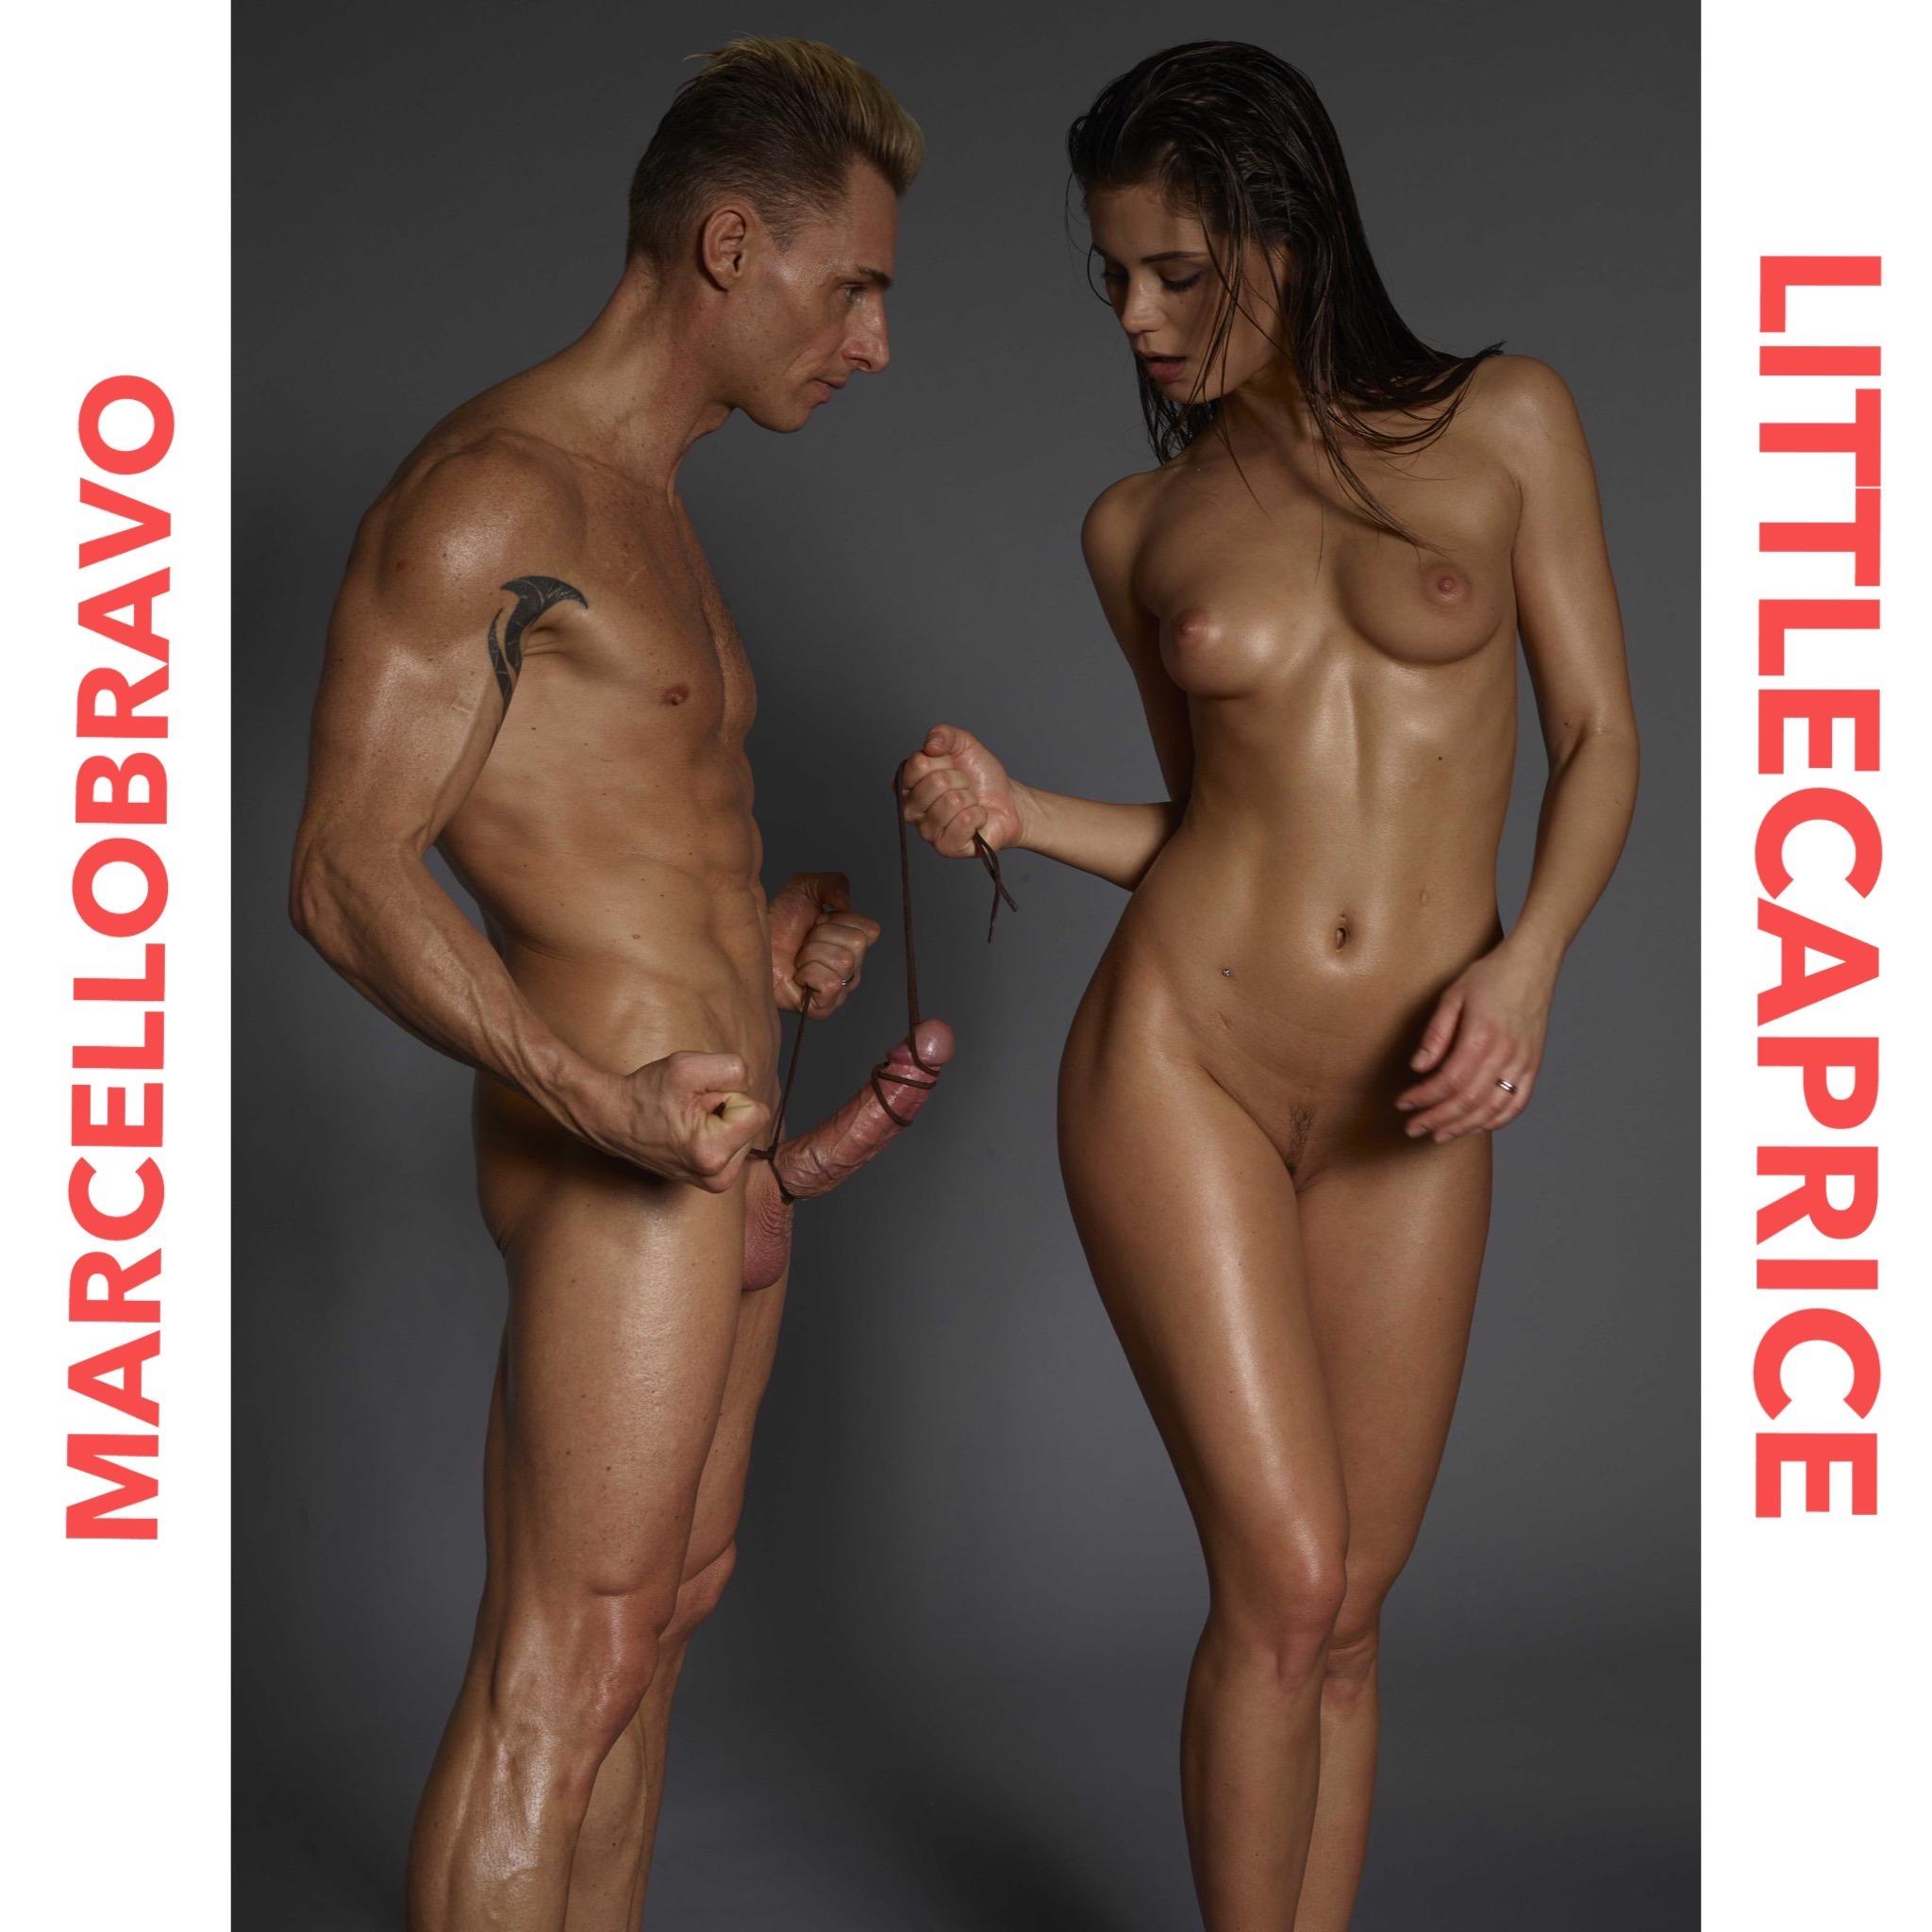 Littlecaprice.com